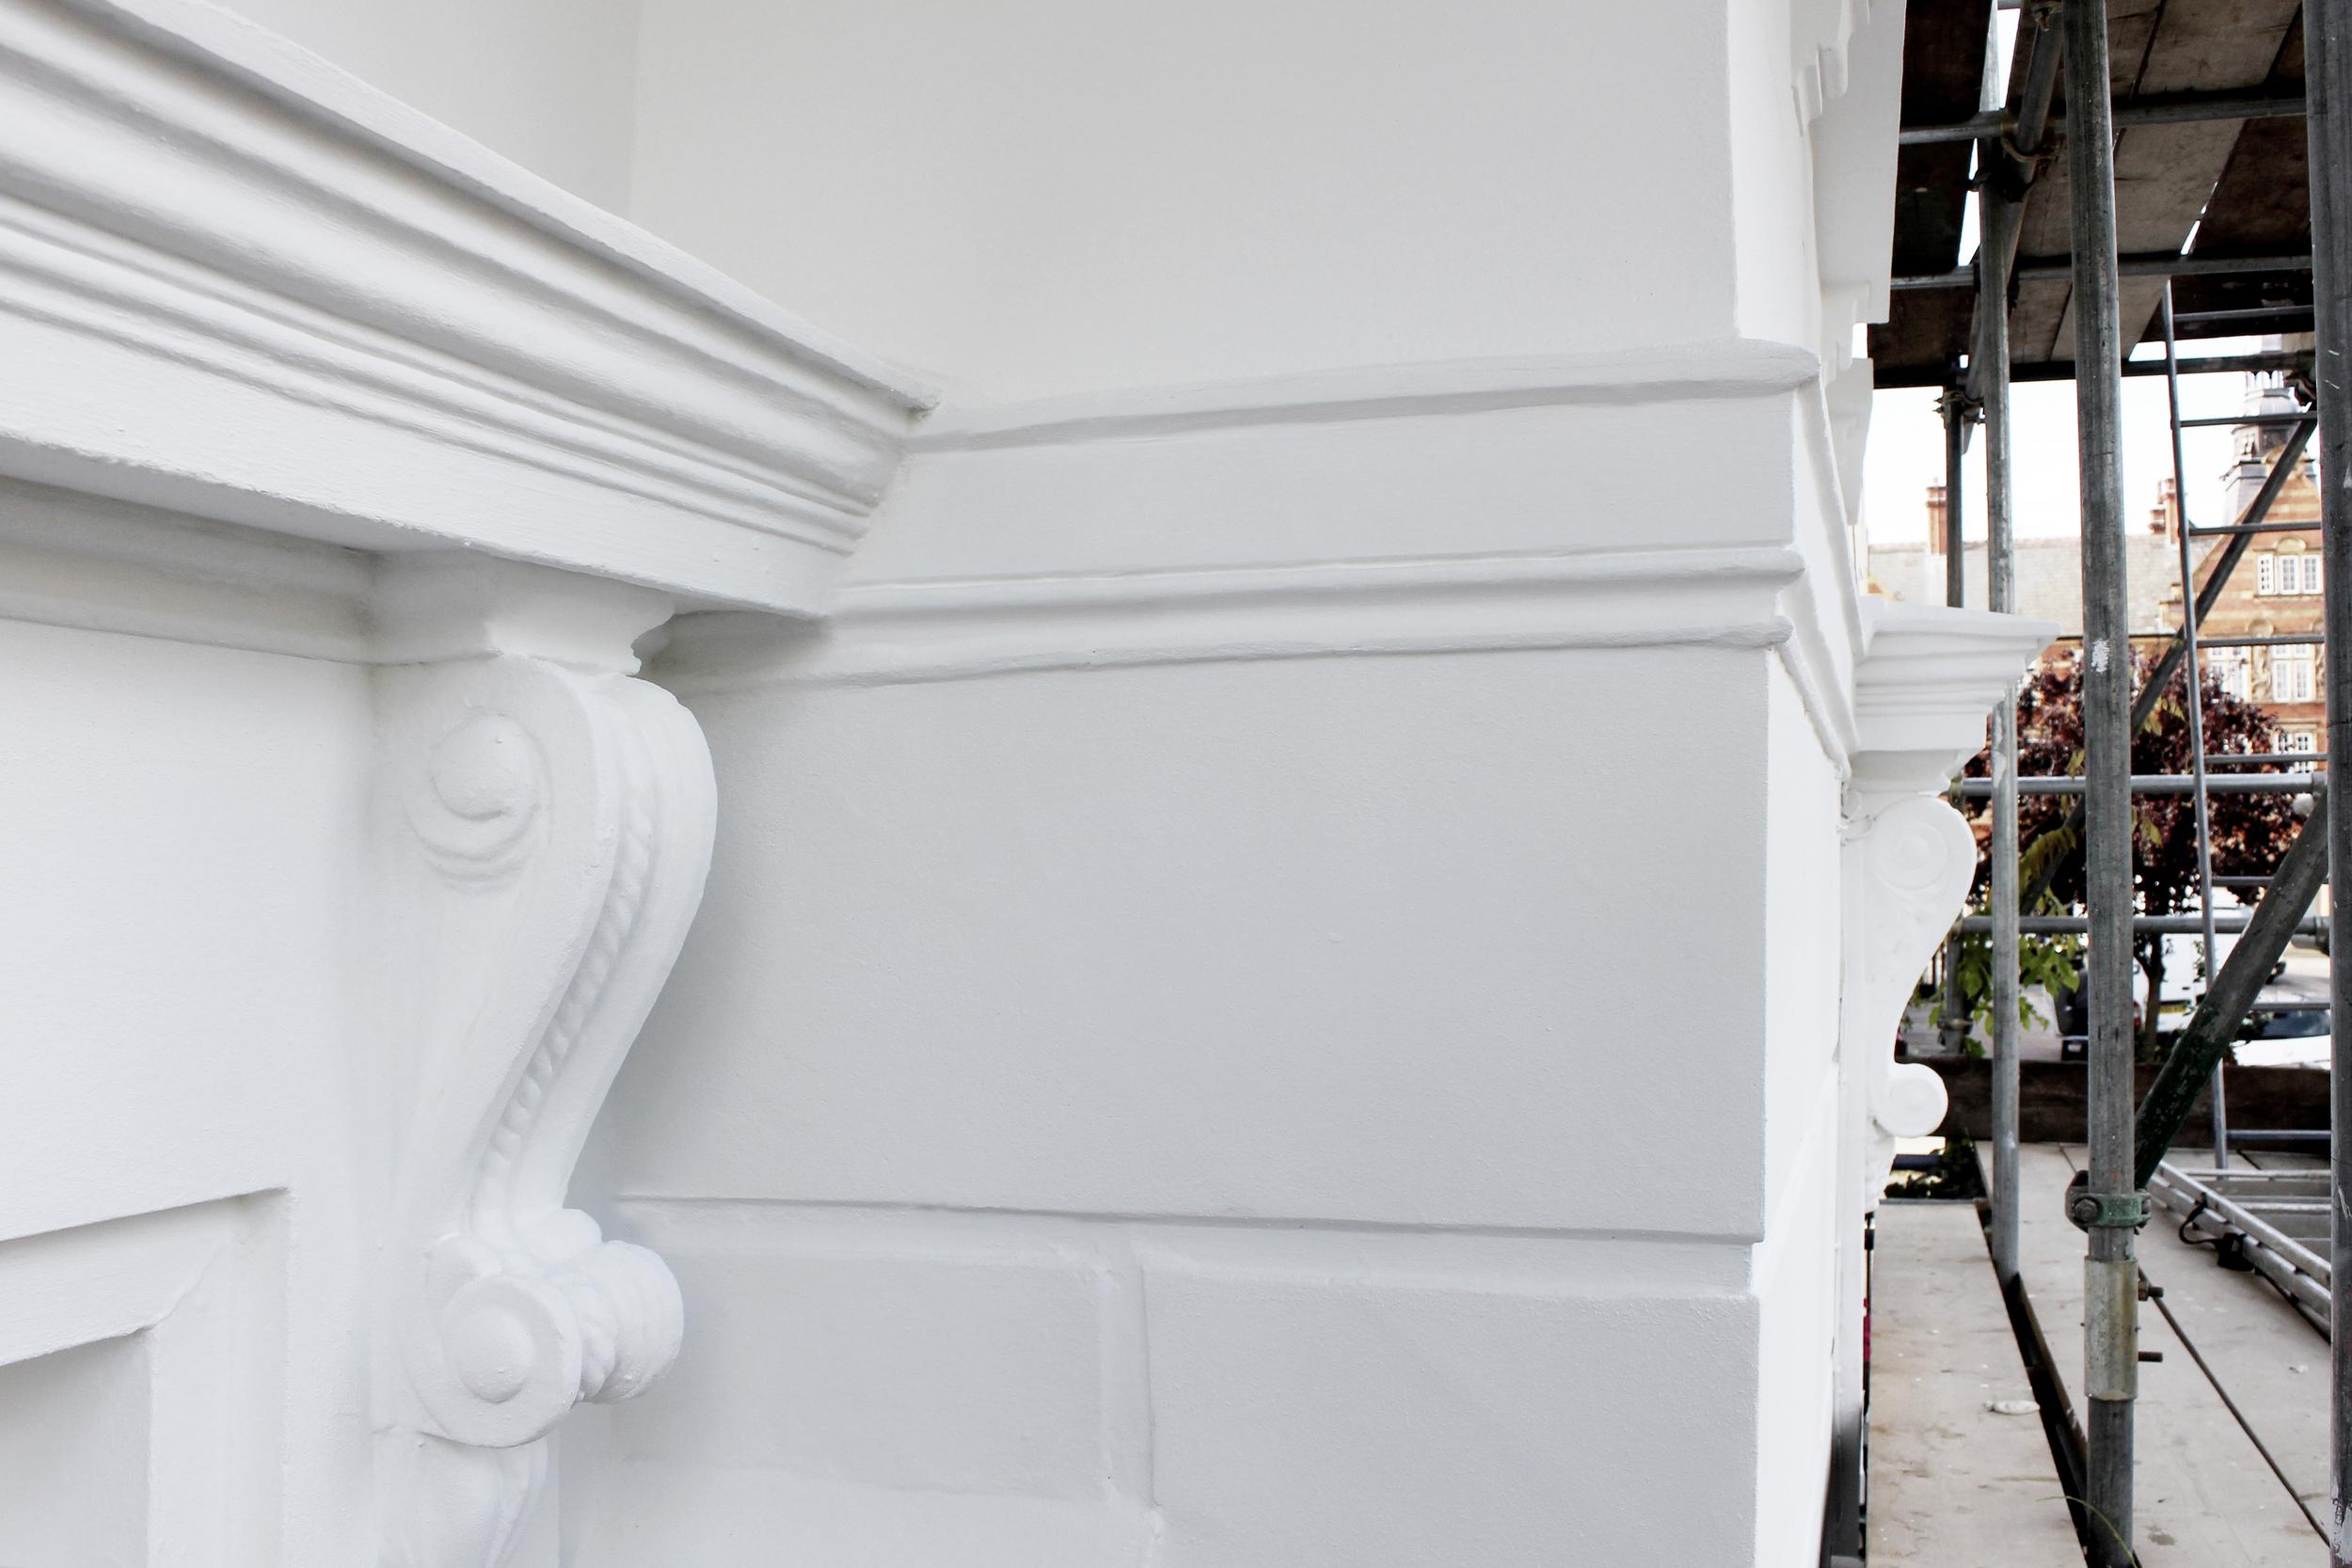 #NHRenovations #Painter #Decorator #London #Kentishtown #Kentish #Listedbuilding #Windows #Masonry #Limeplaster #Keim #Keimminerals #Scrolls #Exterior #Building #Finishedcoat #Beautiful